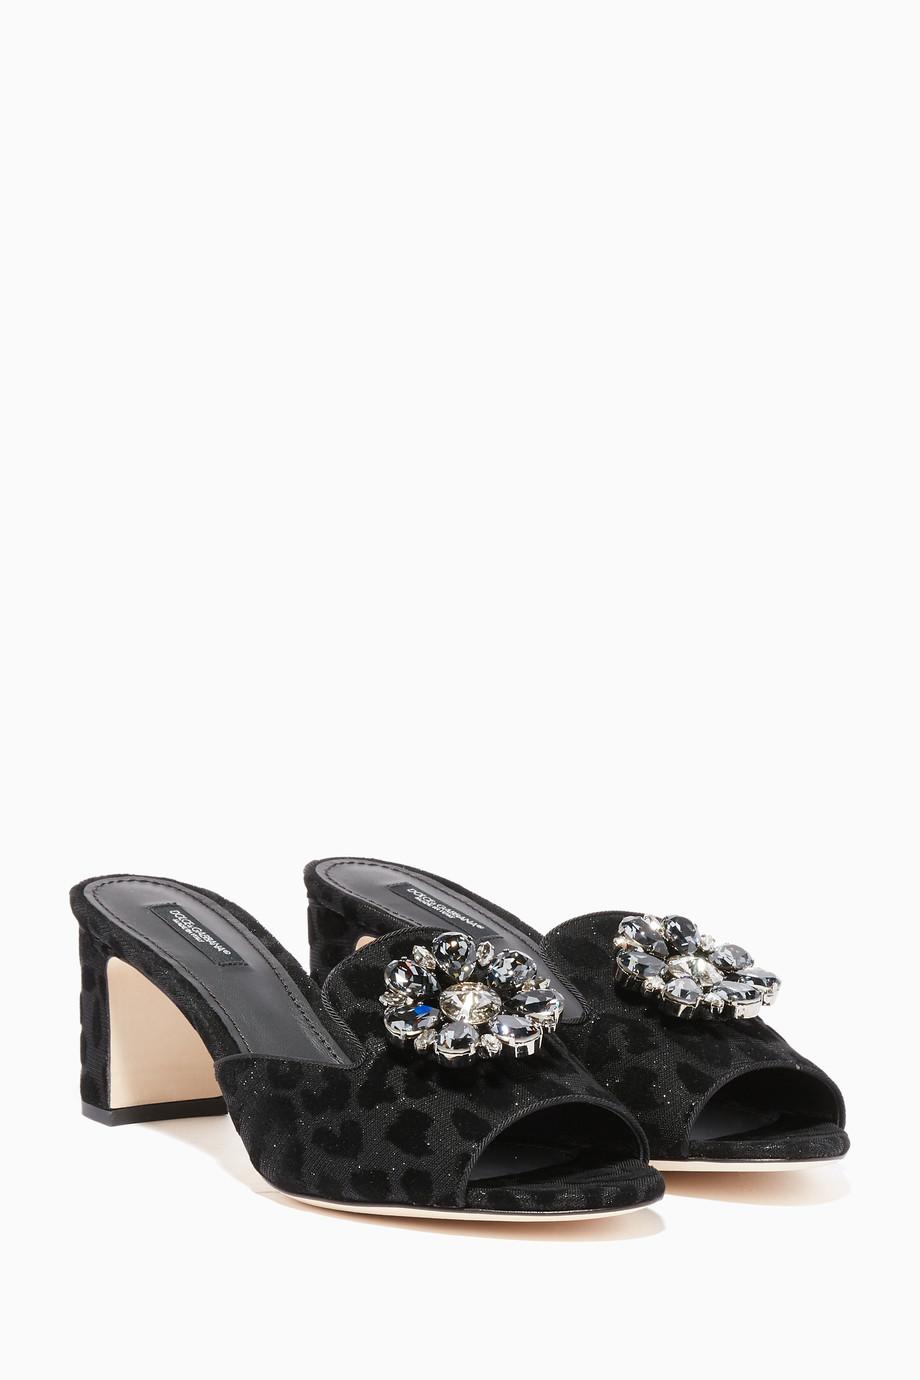 98eb6f3f18ecc9 Shop Dolce   Gabbana Black Black Leopard-Print Bianca Embellished ...